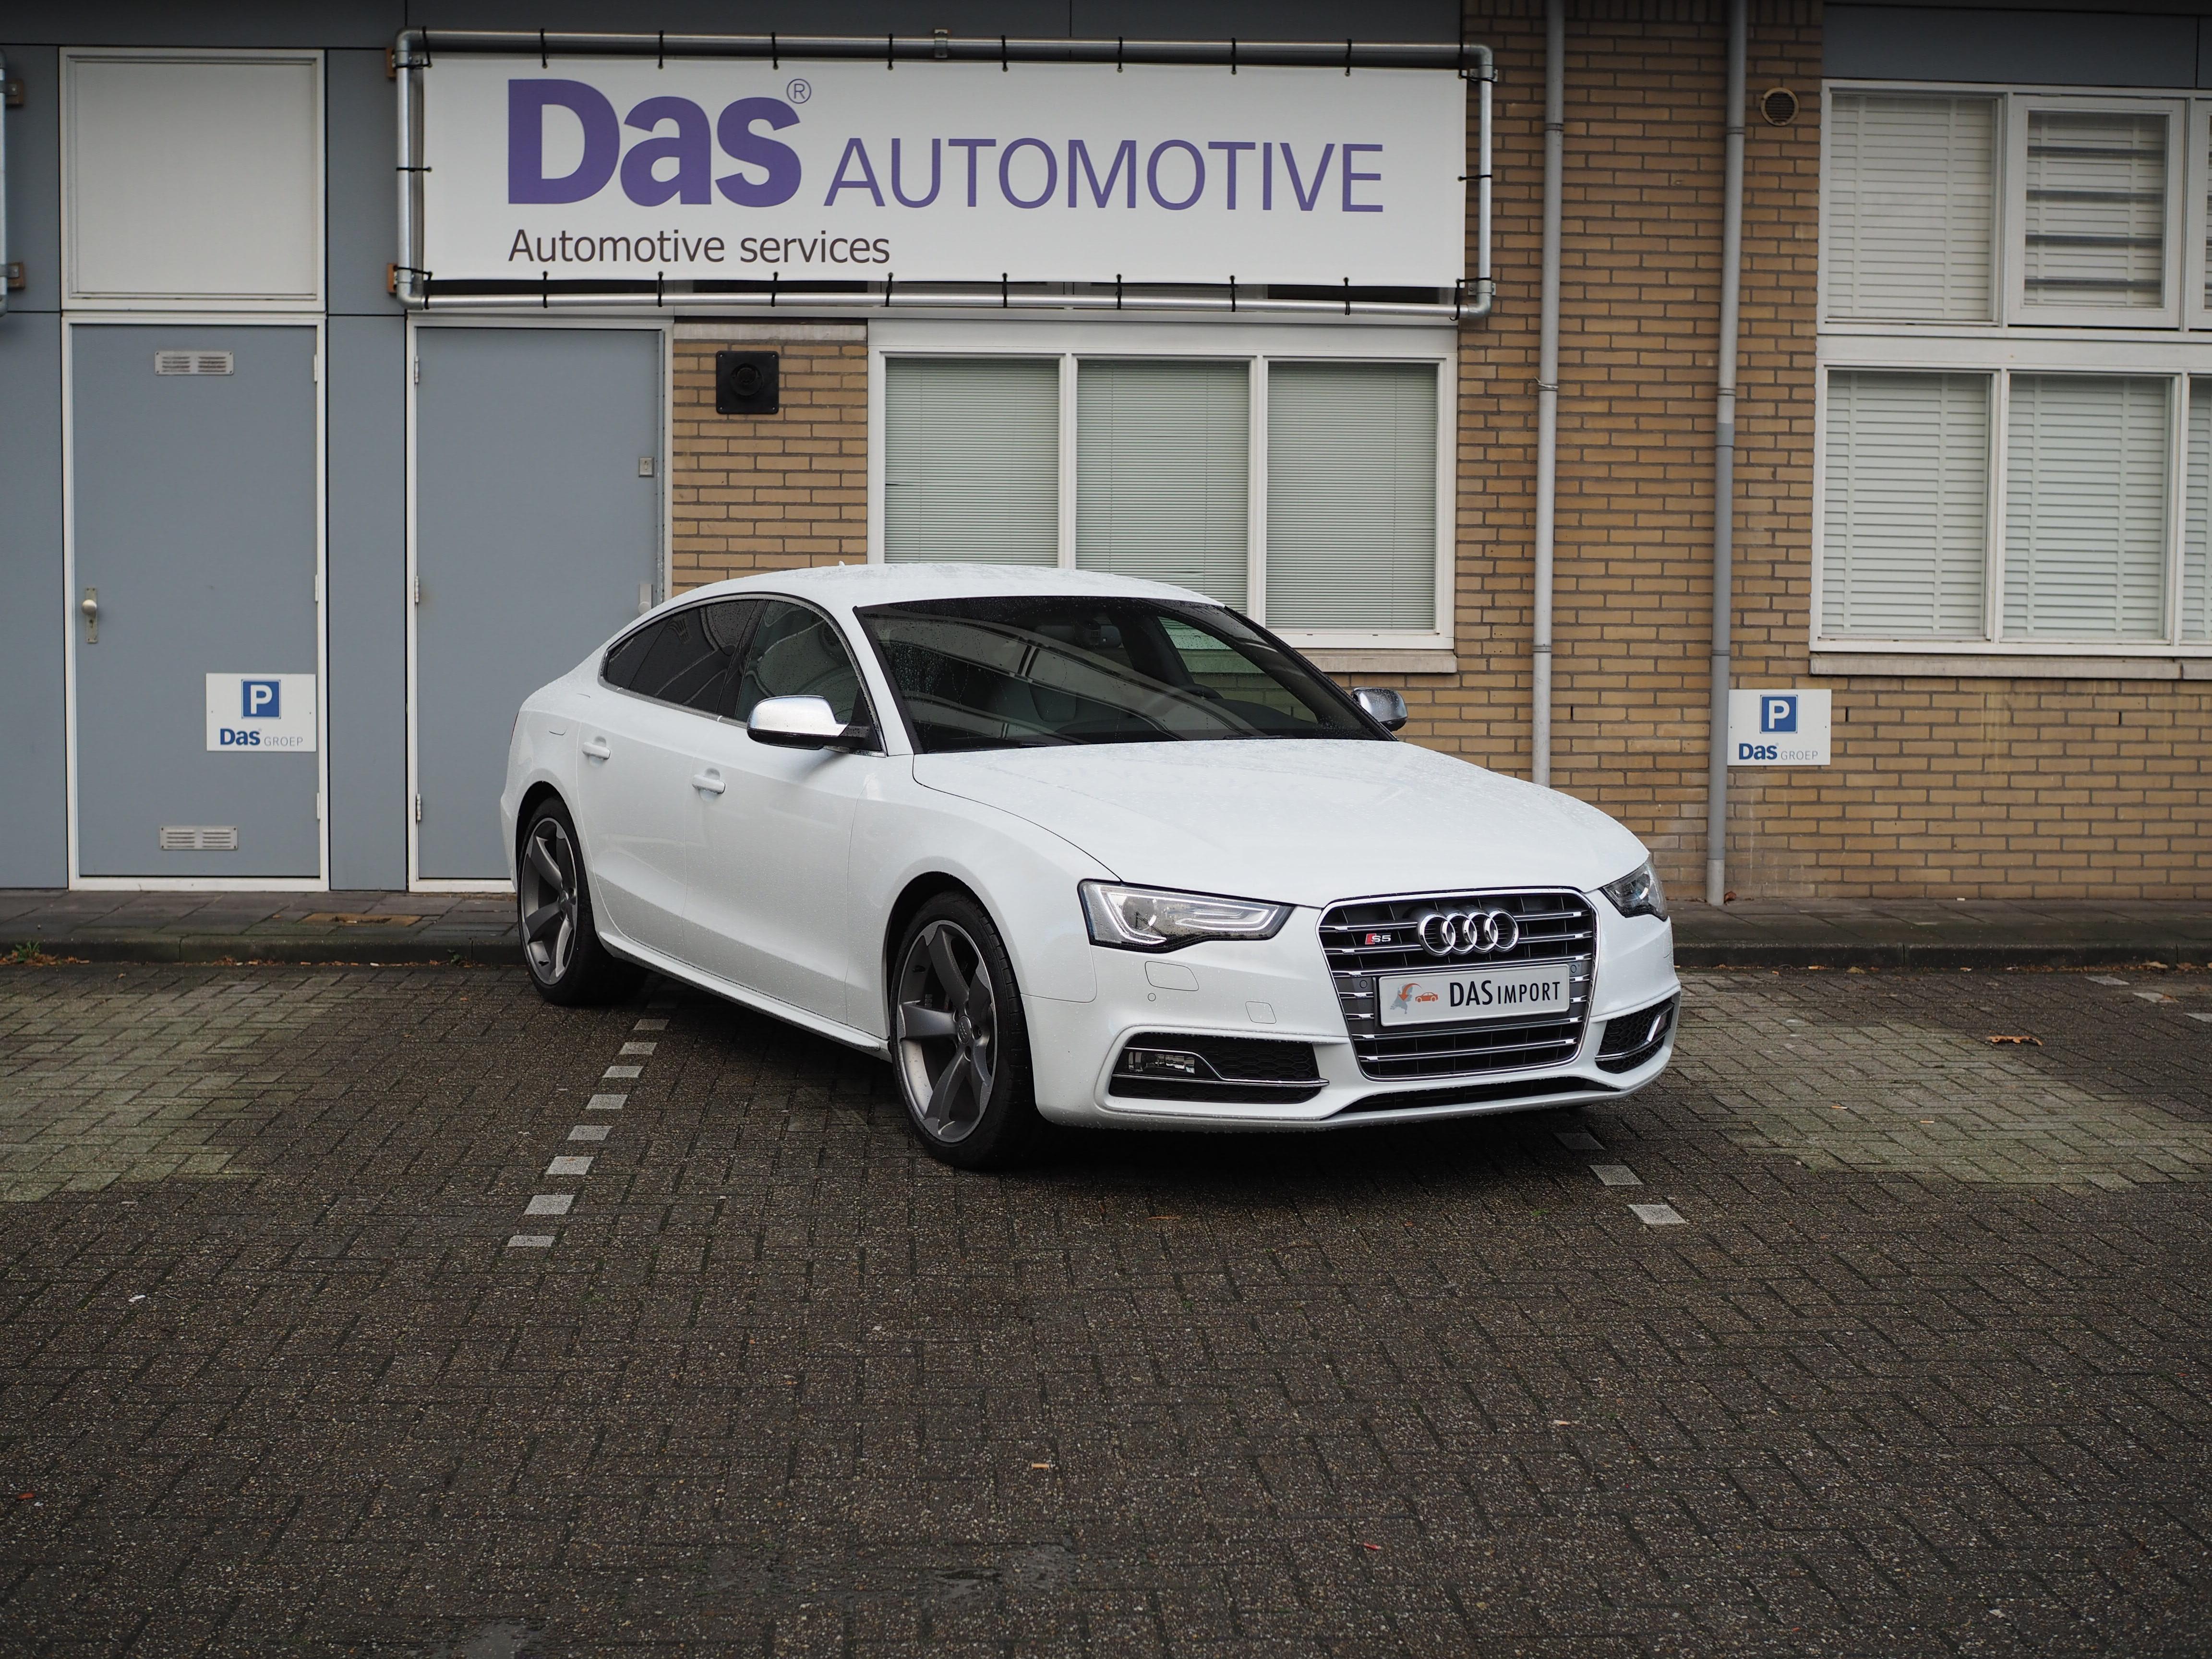 Importauto: Audi A5 Sportback S5 3.0 TFSI 245kW quattro S tronic 9/2013